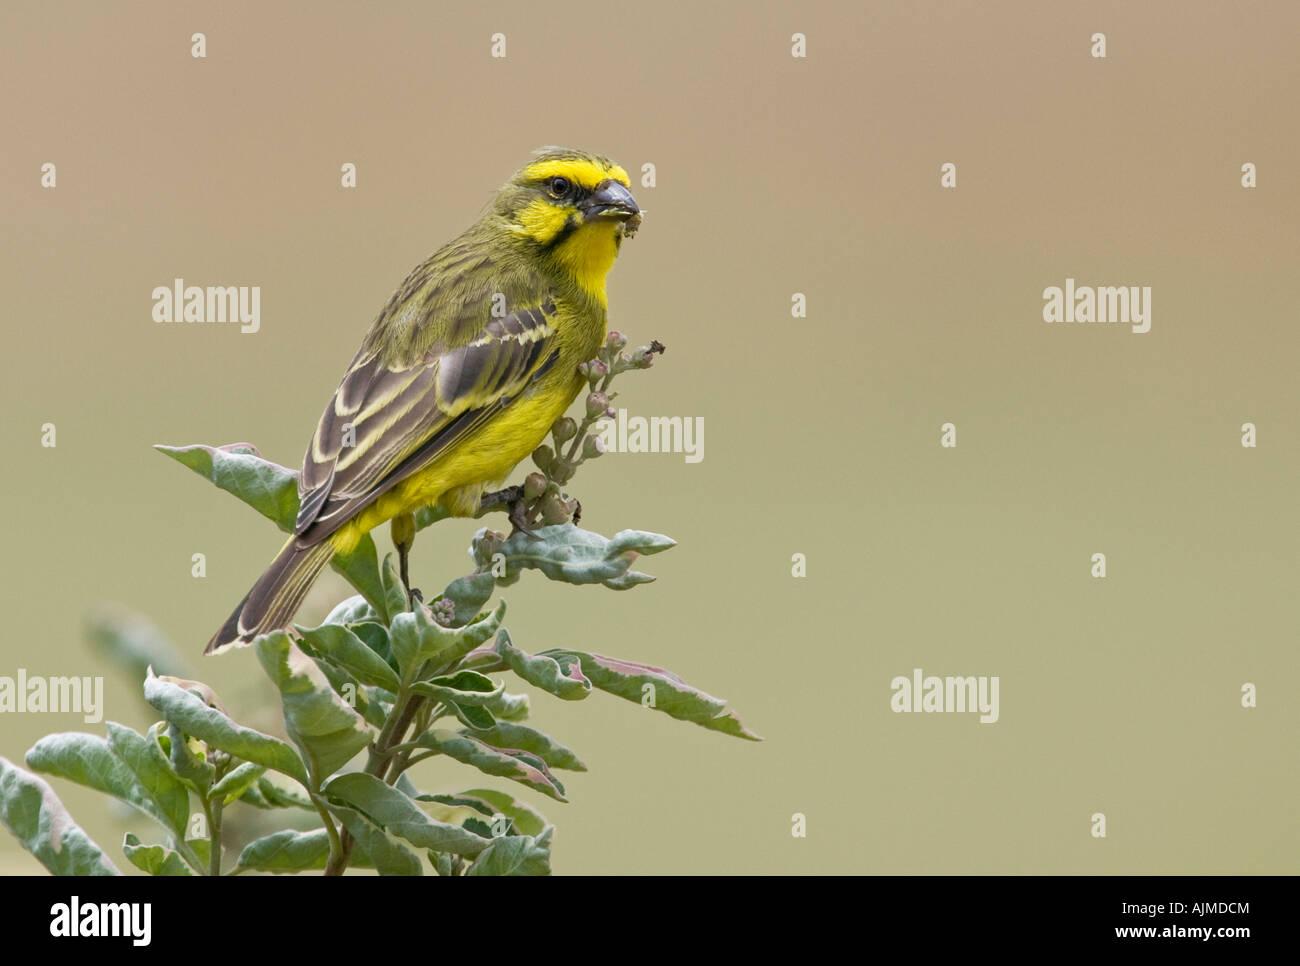 Yellow Fronted Canary Portrait Masai Mara Kenya Stock Photo Alamy